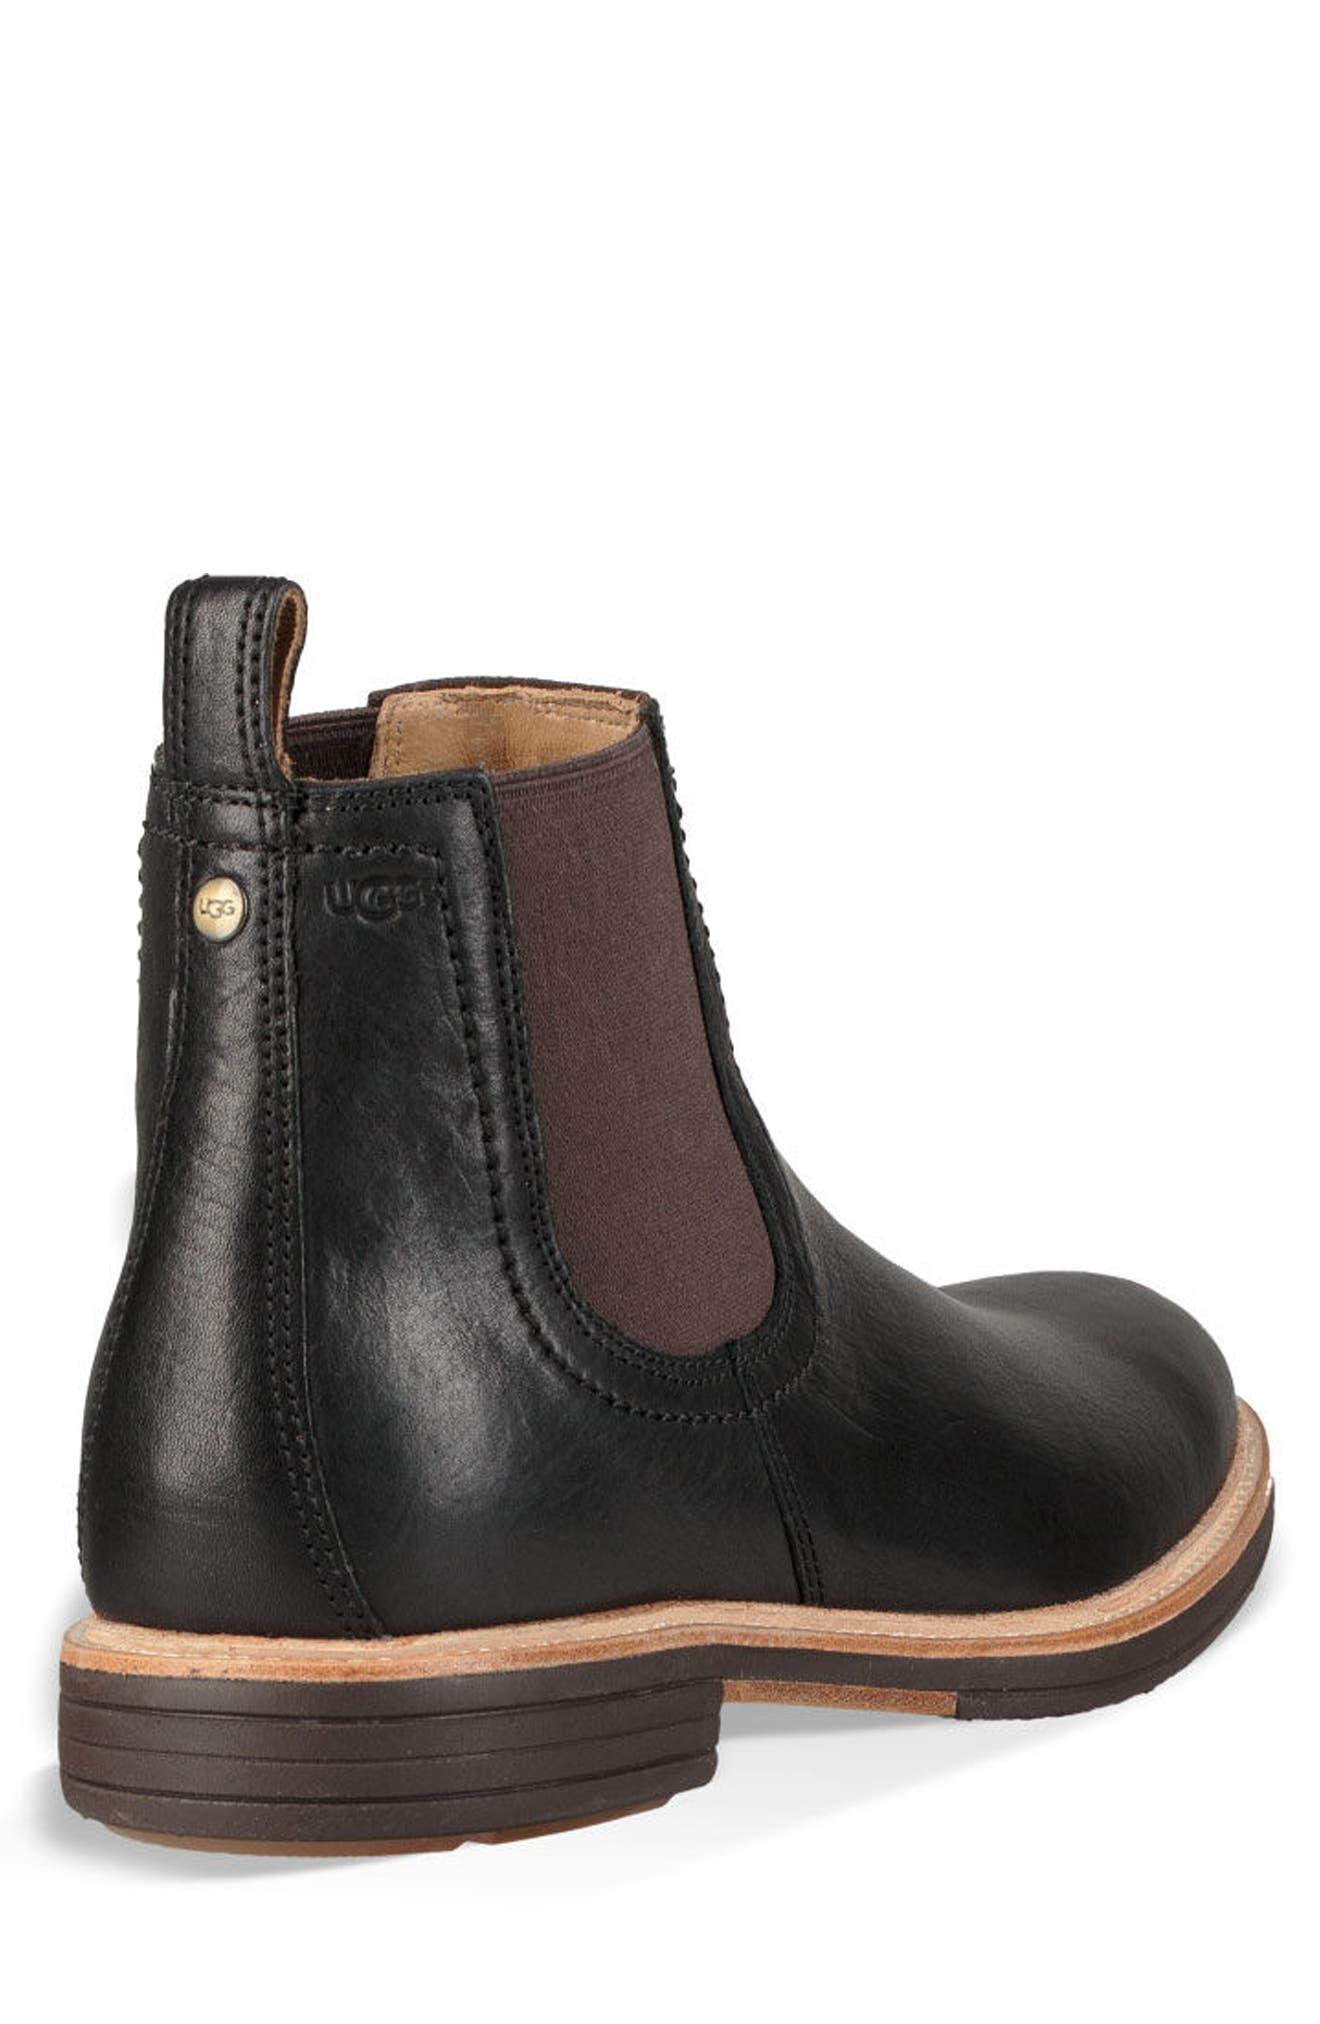 Baldvin Chelsea Boot,                             Alternate thumbnail 2, color,                             BLACK LEATHER/SUEDE